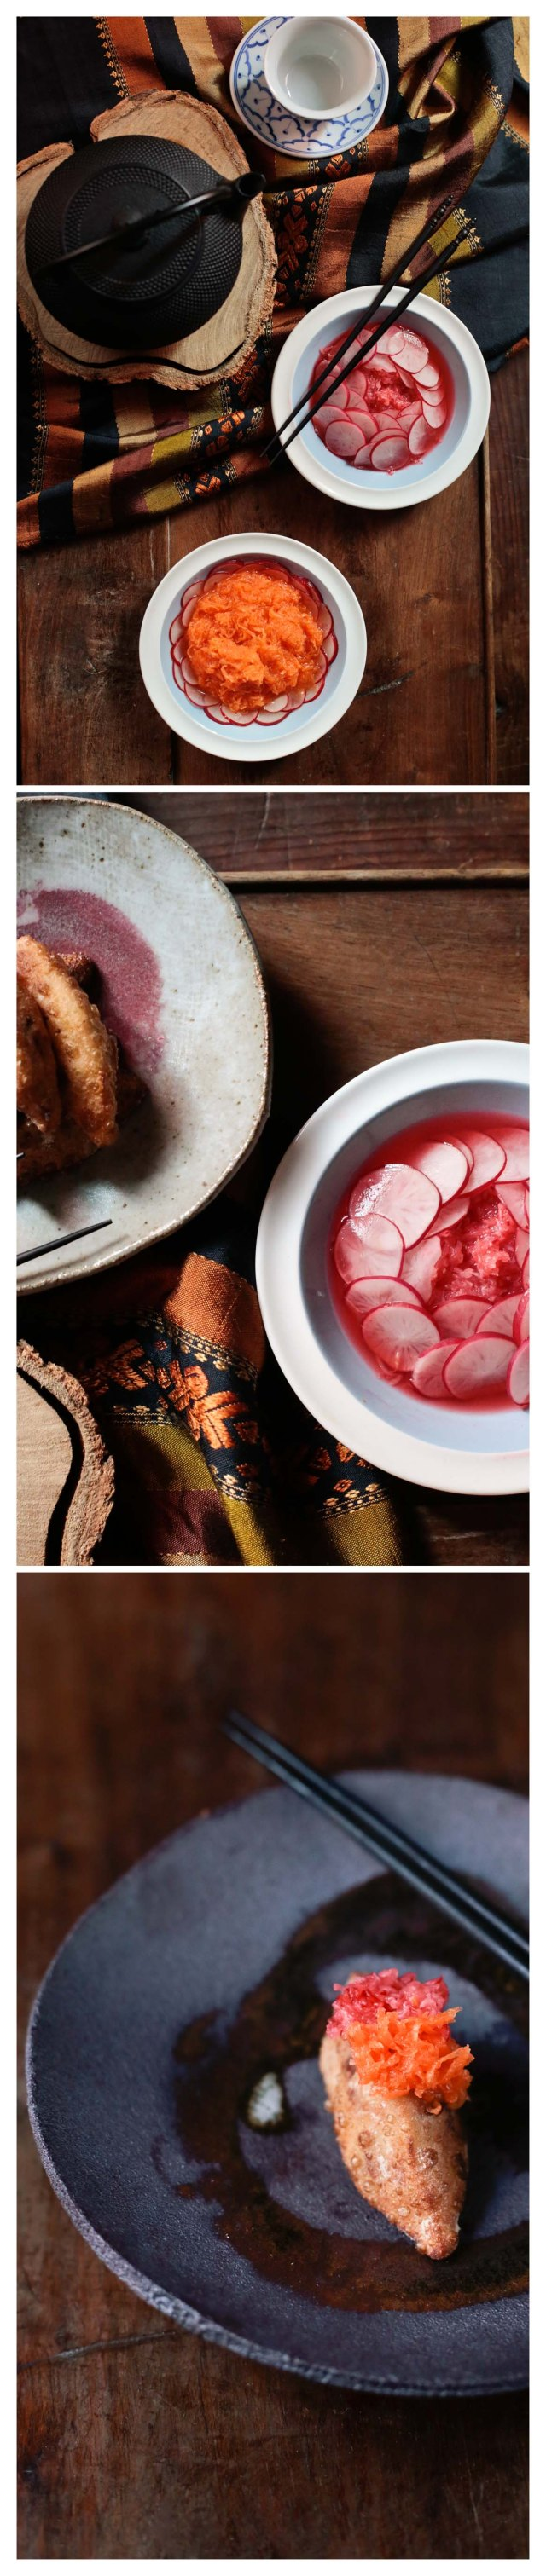 dim sum: empanadillas de arroz glutinoso